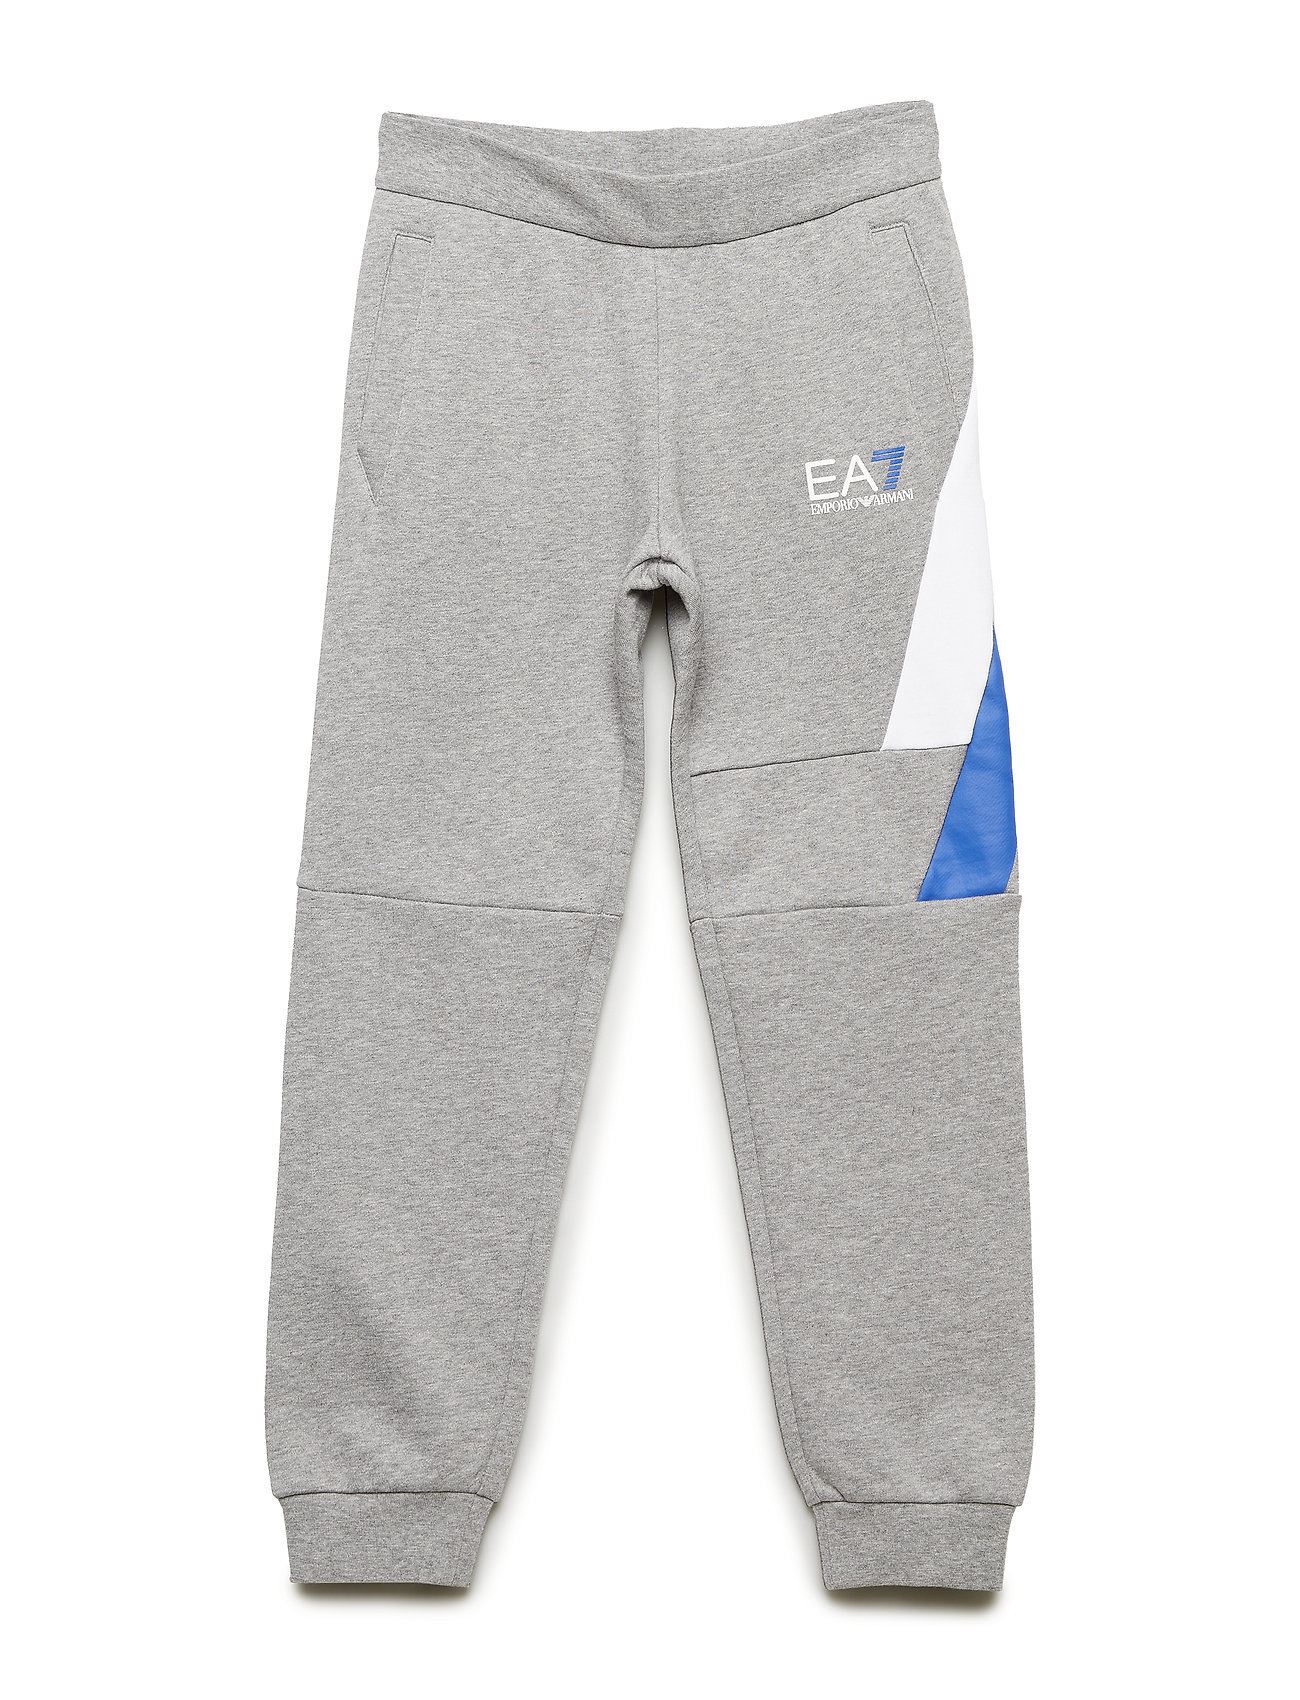 Image of Pantaloni Sweatpants Hyggebukser Grå EA7 (3106982977)